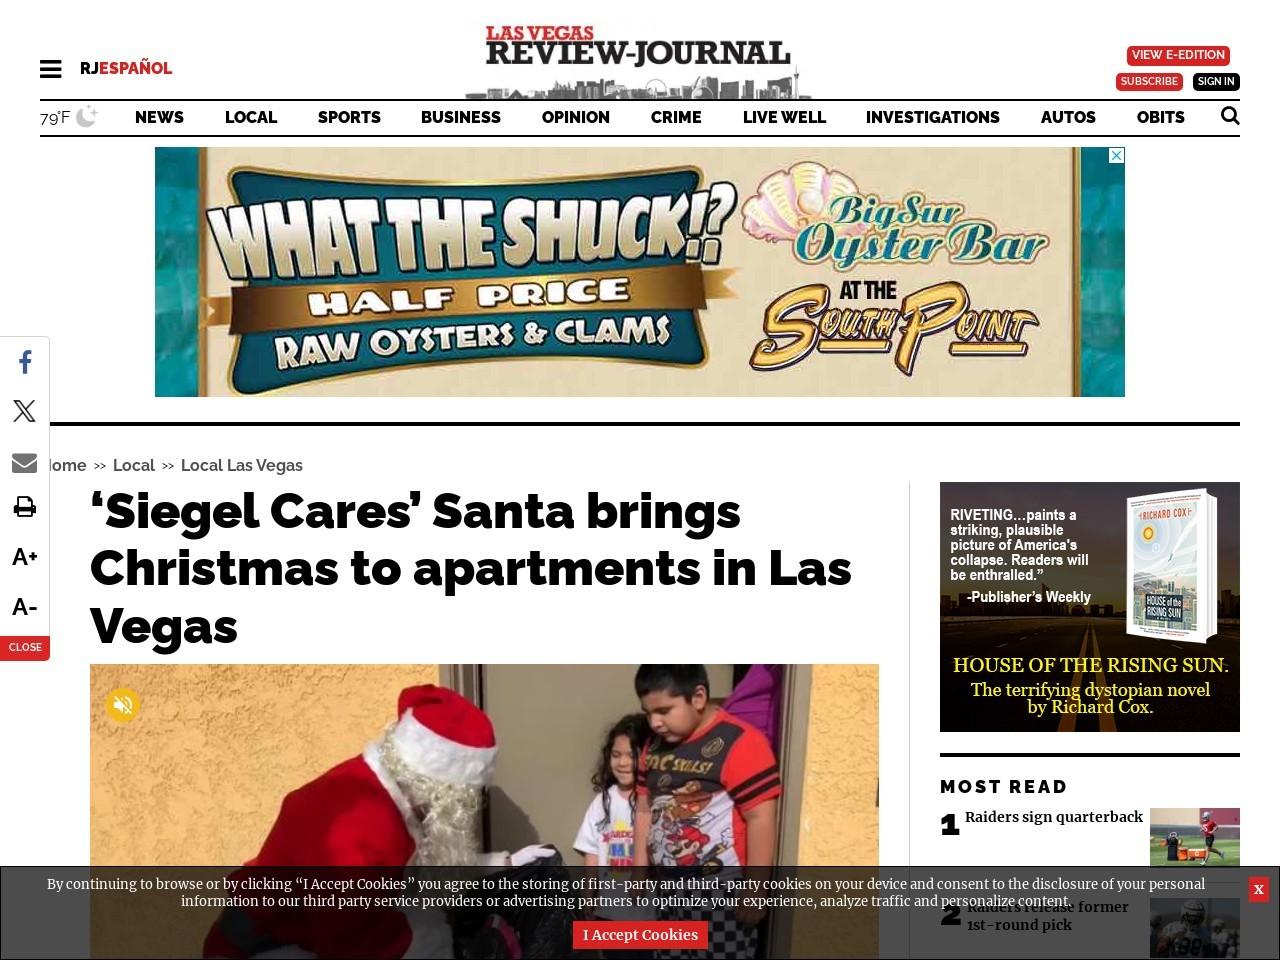 'Siegel Cares' Santa brings Christmas to apartments in Las Vegas